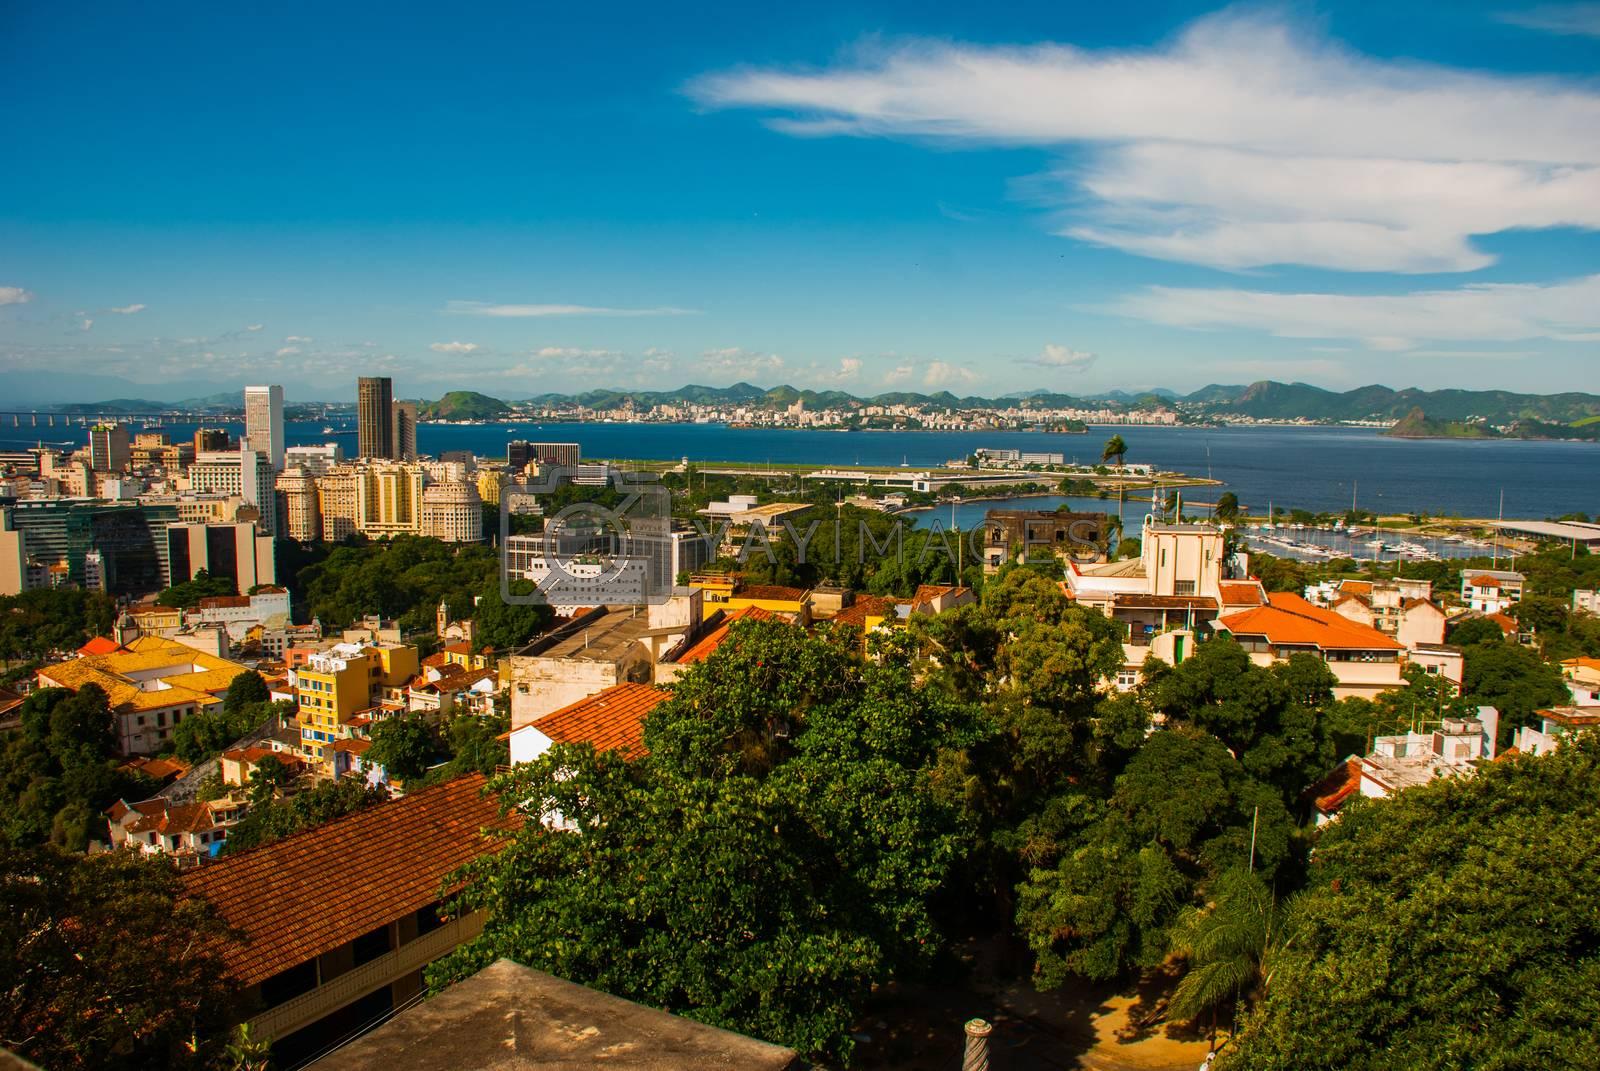 Brazil, City of Rio de Janeiro, Santa Teresa Neighbourhood. Top view of the city from the Ruins of the house Laurinda. Parque das Ruinas. America